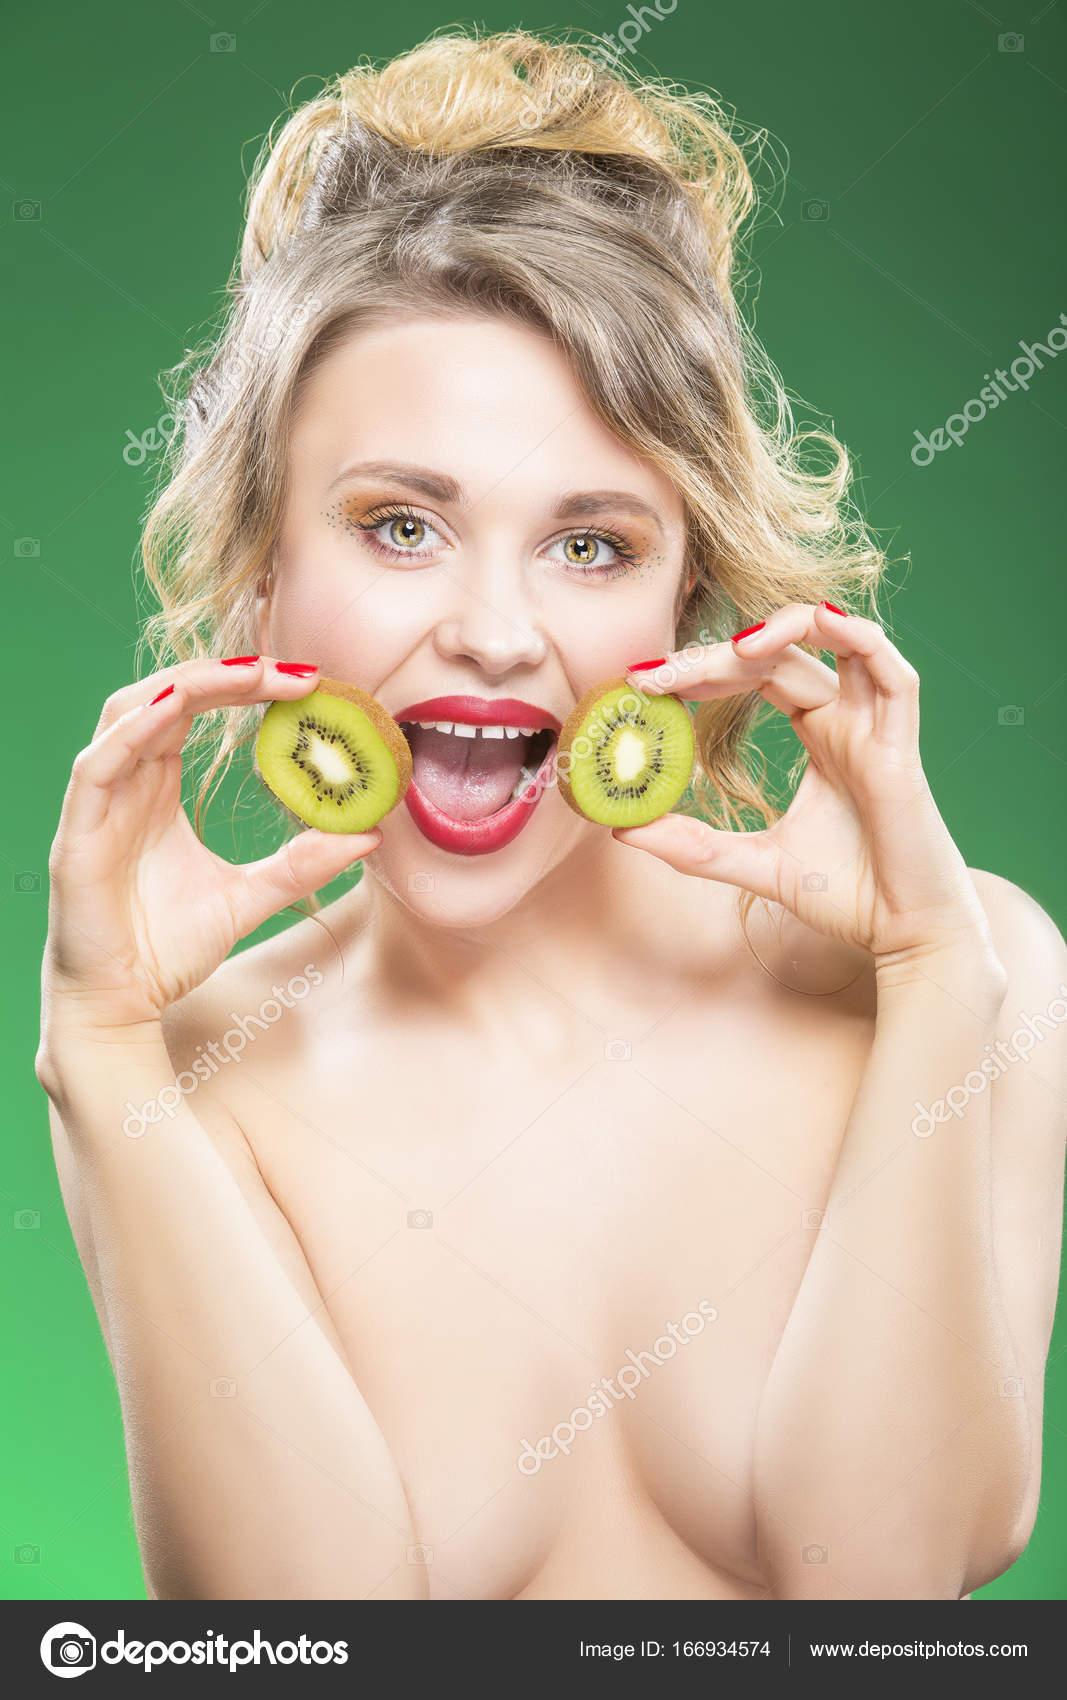 Girls having fun with fruit naked what